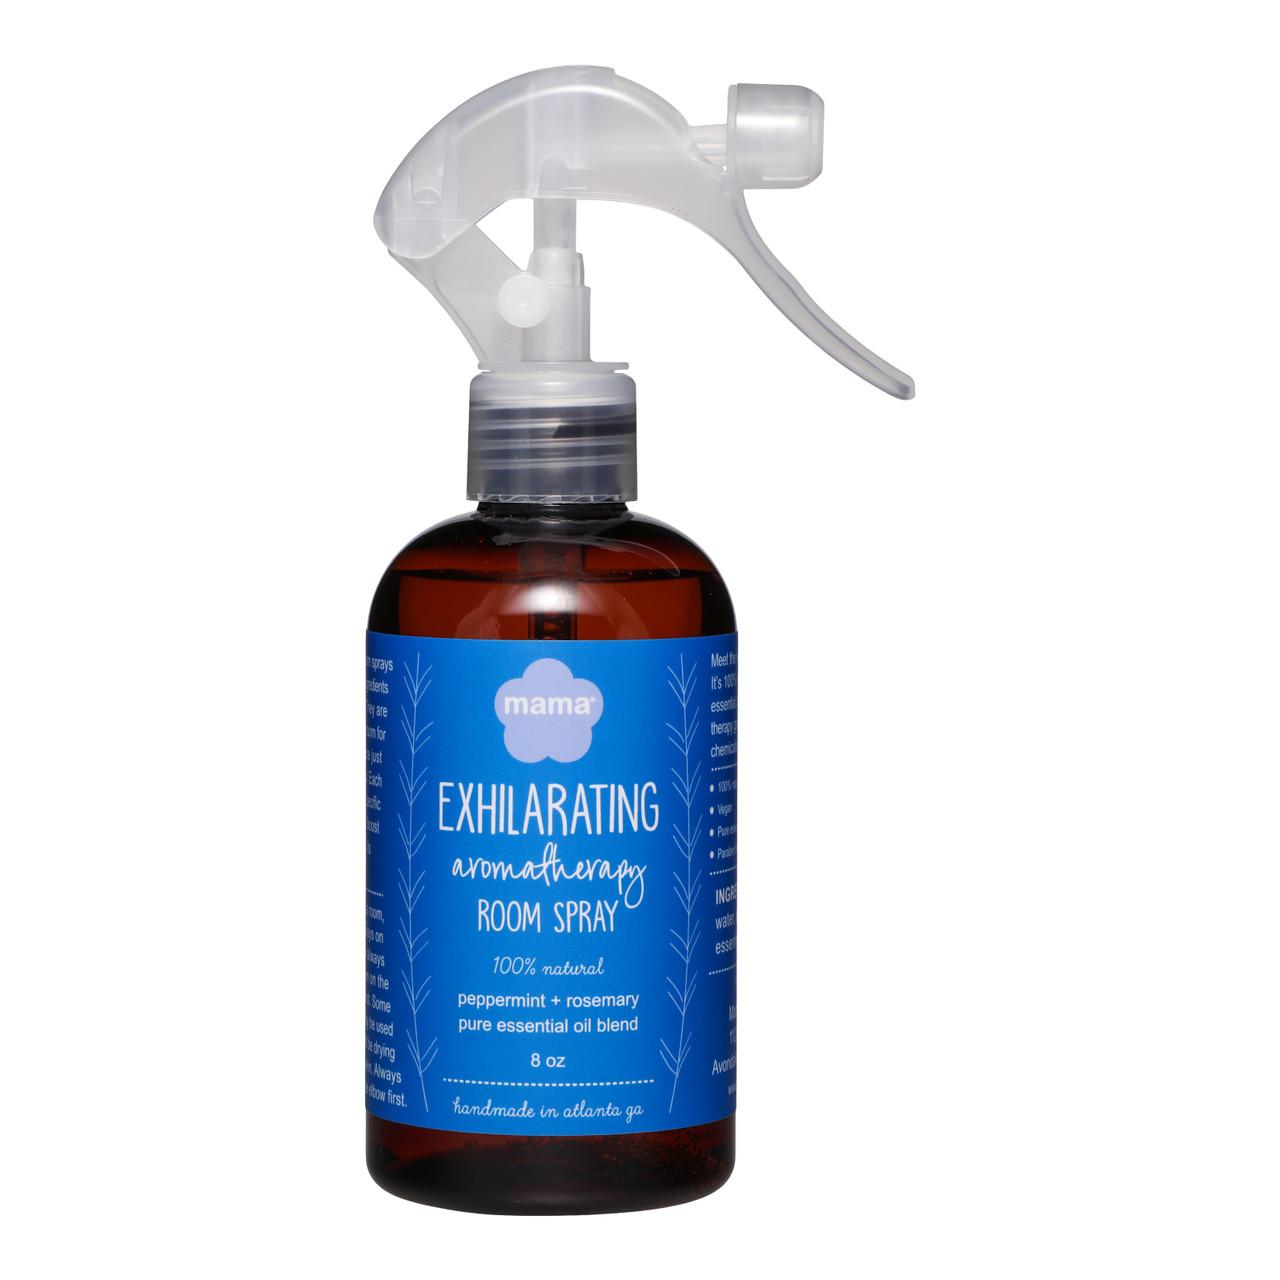 Peppermint + Rosemary (Exhilarating) Room Spray | Mama Bath + Body